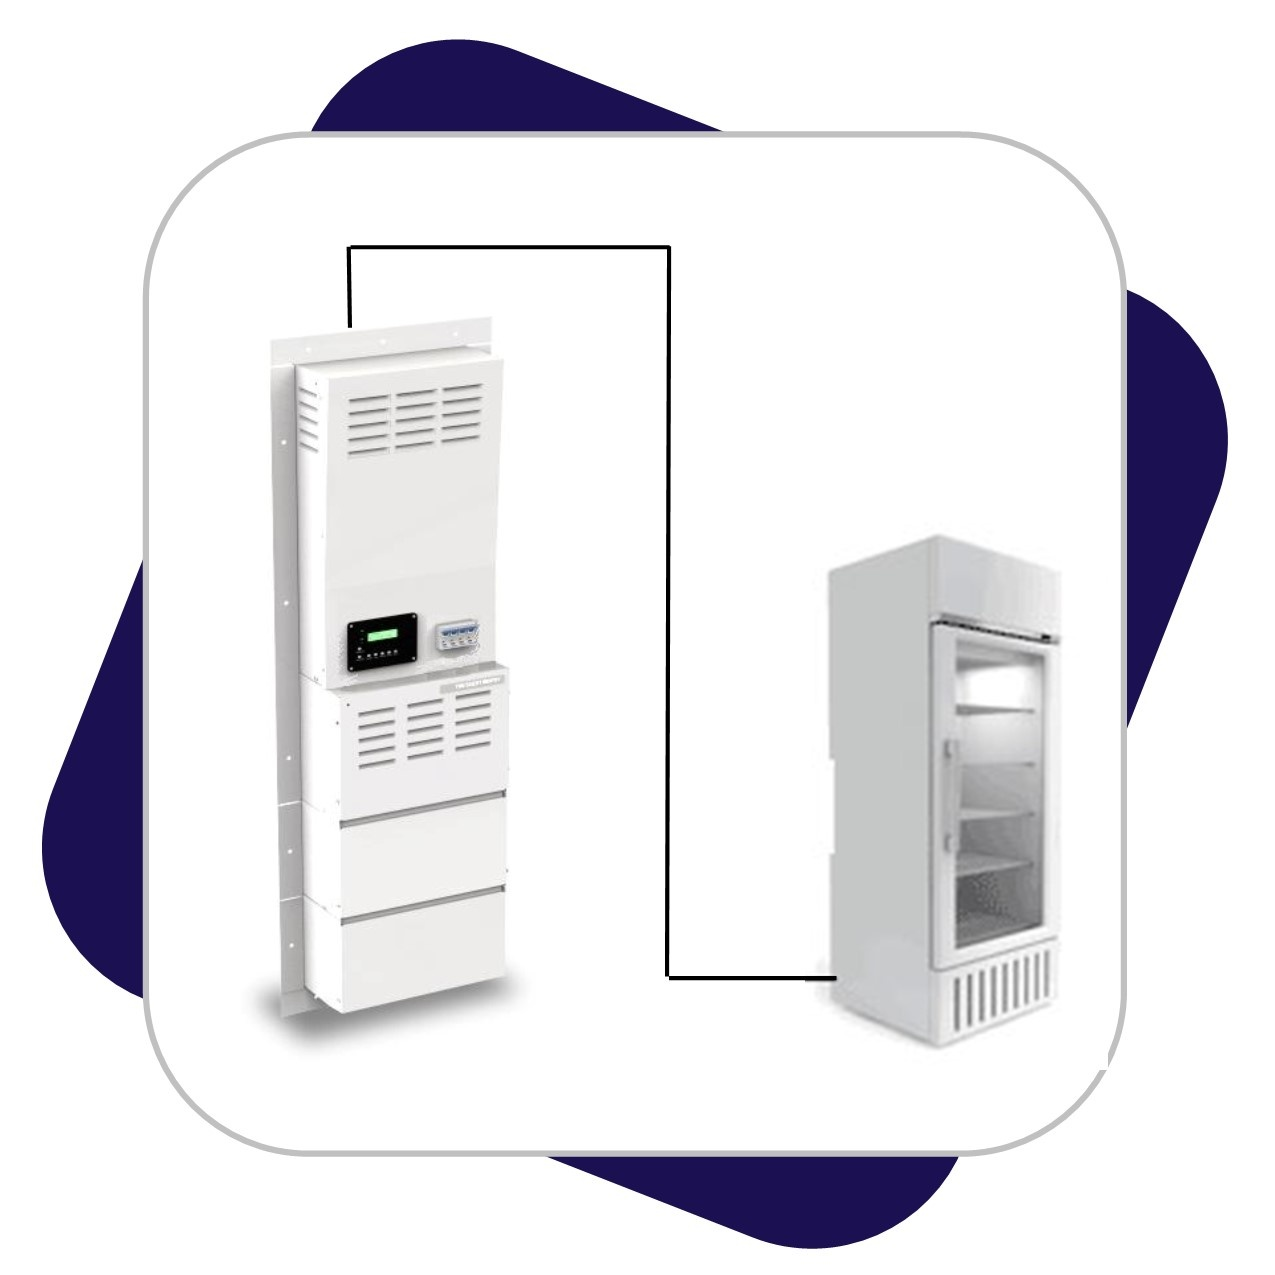 Standalone Refridgerator Battery Backup System